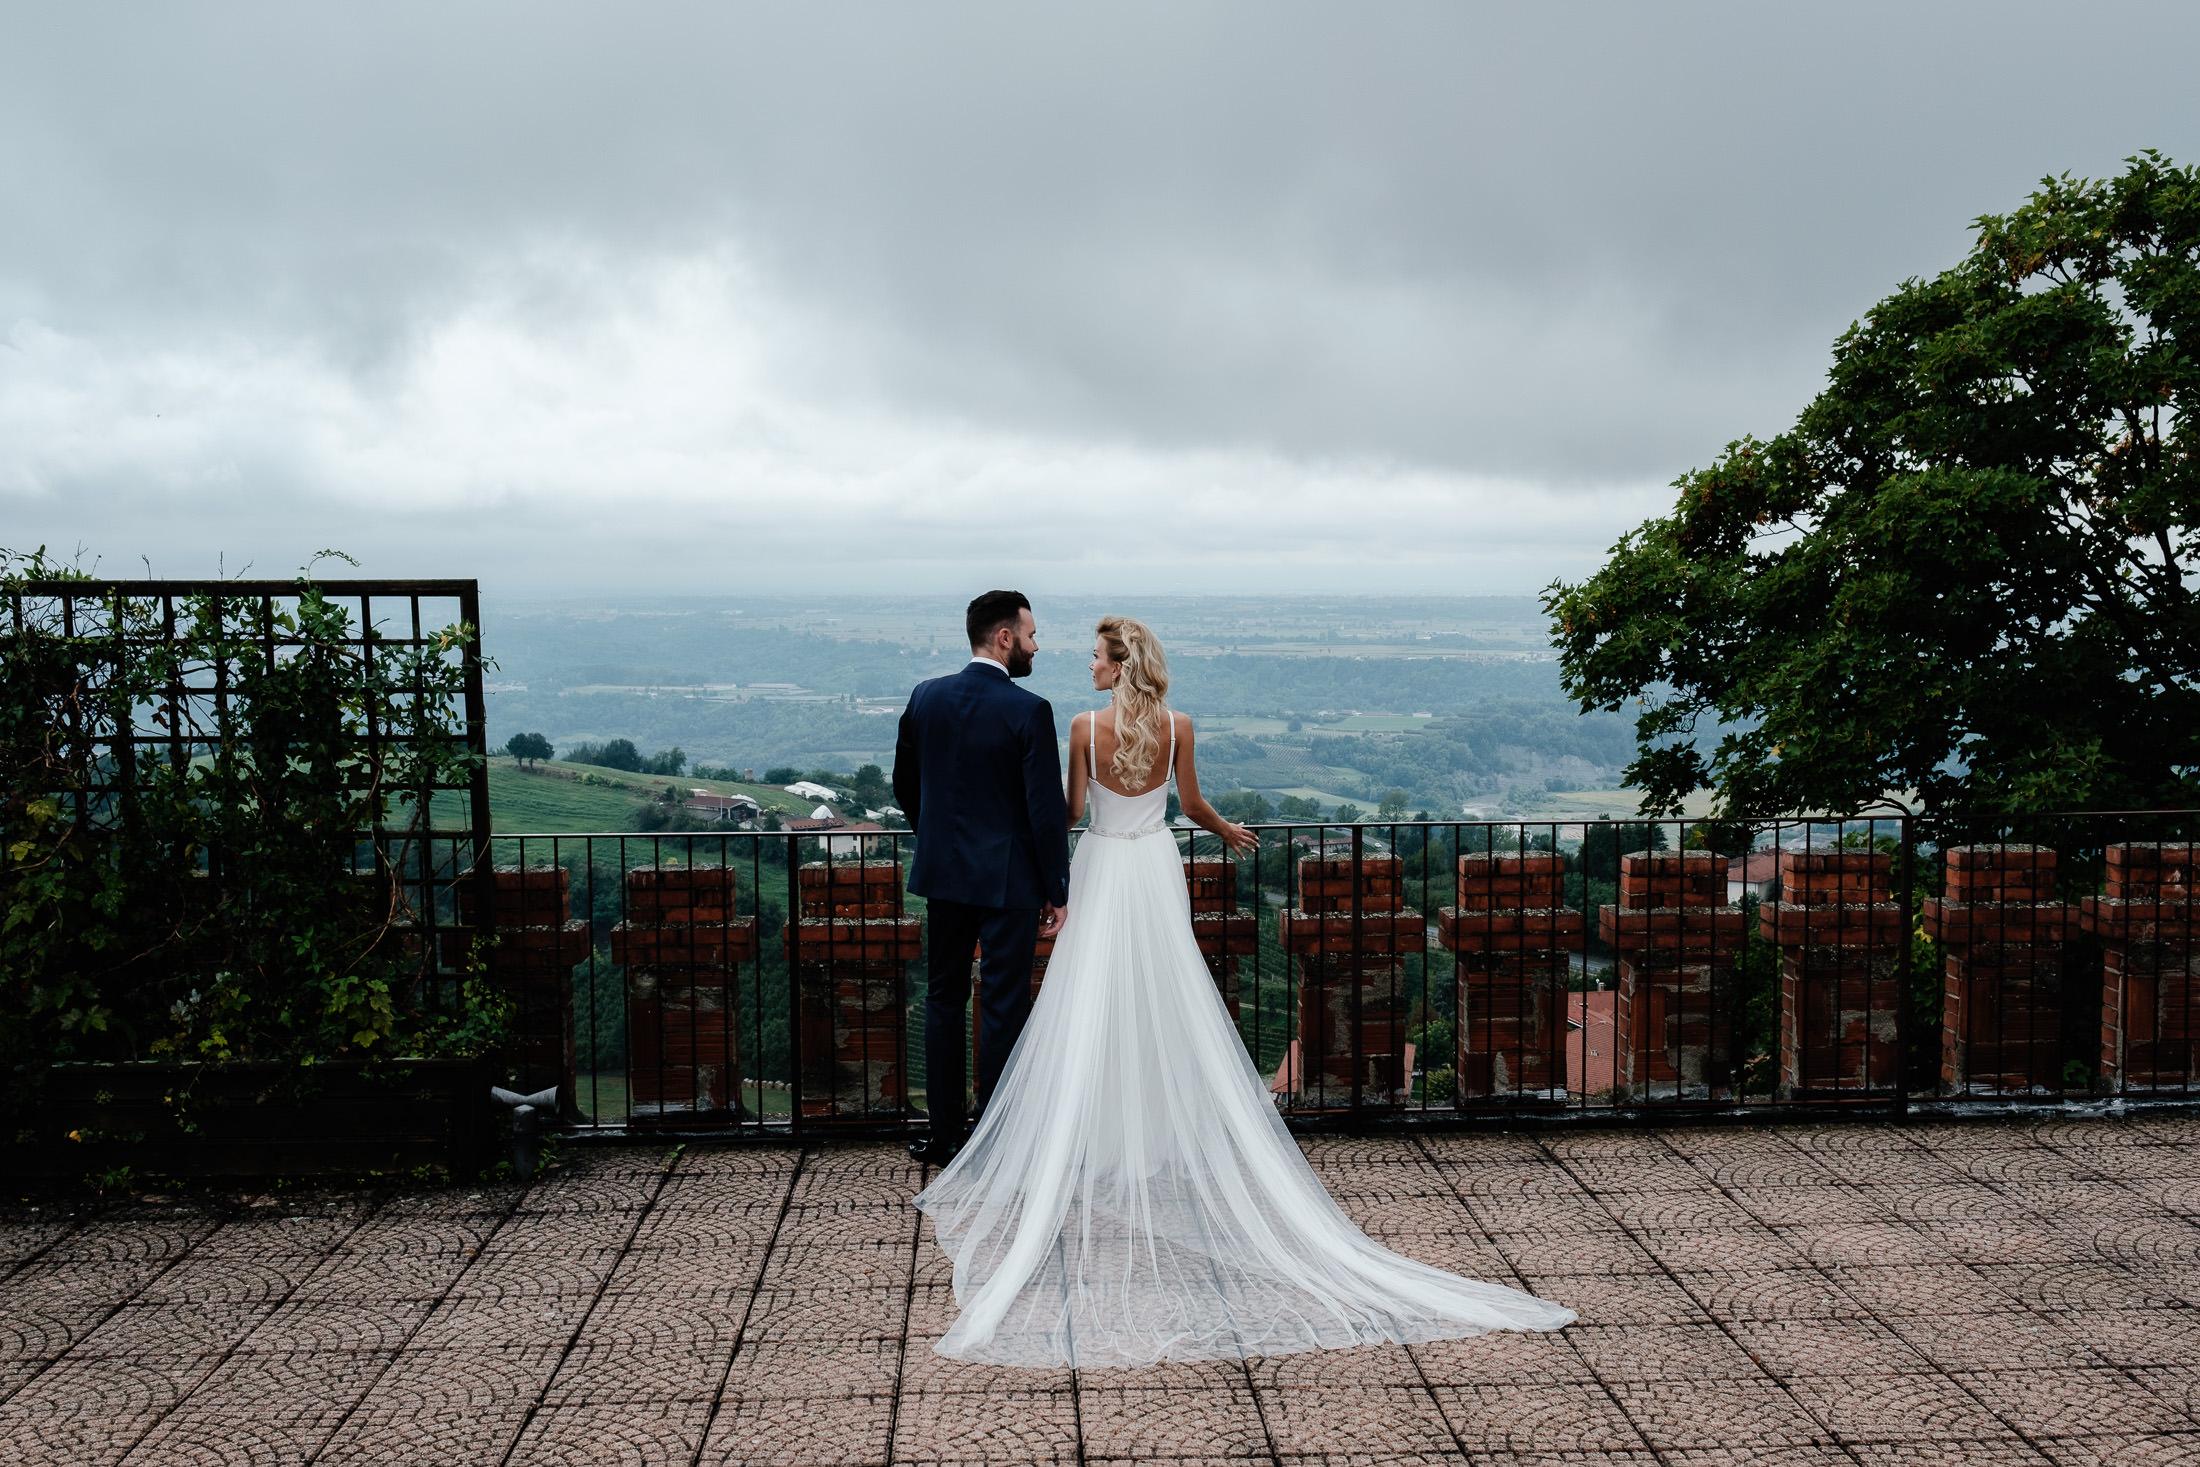 Roger & Sabine – Pre-Wedding